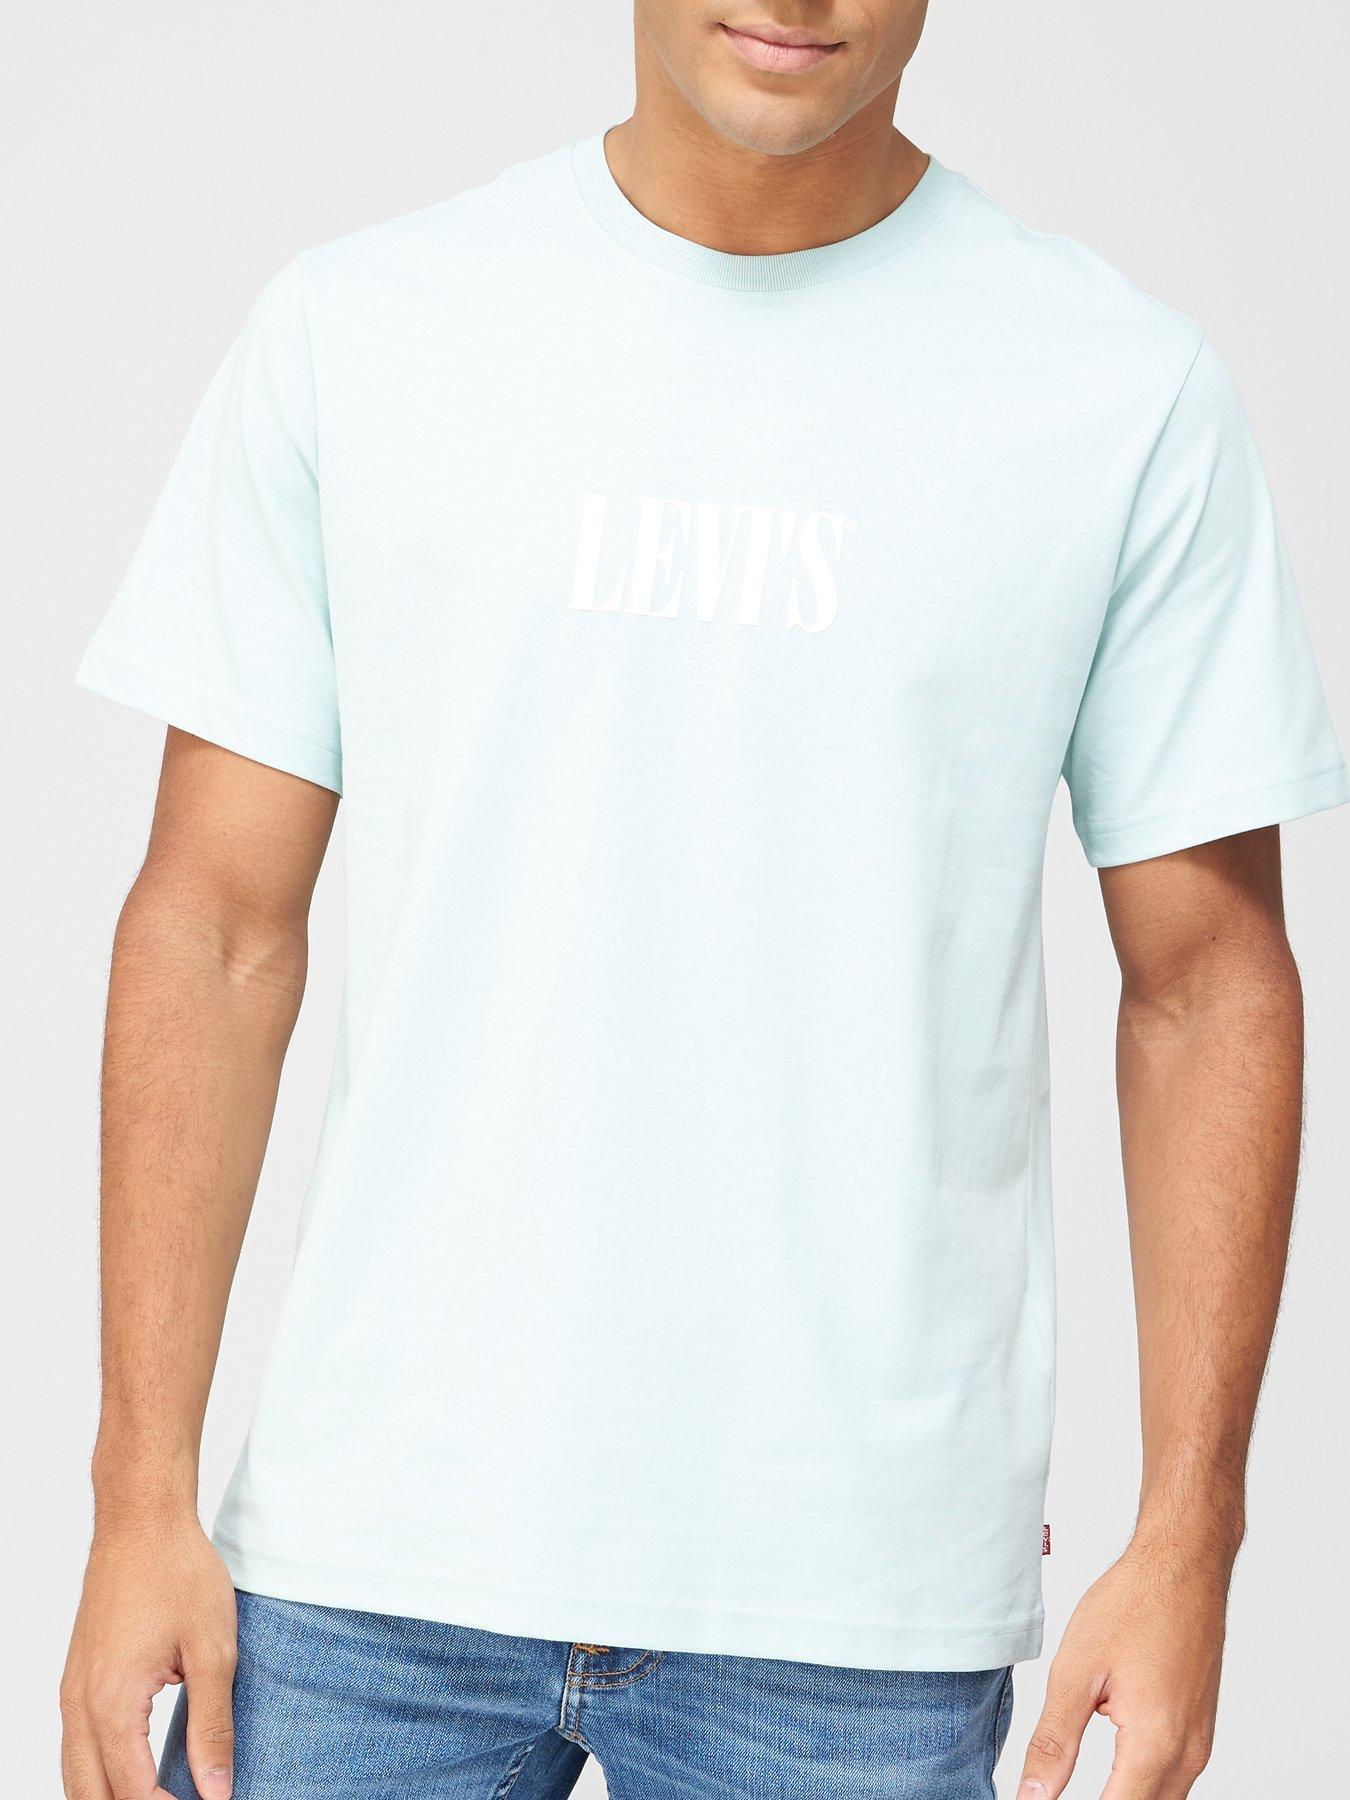 Wrangler Mens Box Logo Regular Fit T-Shirt Grey in Size Large